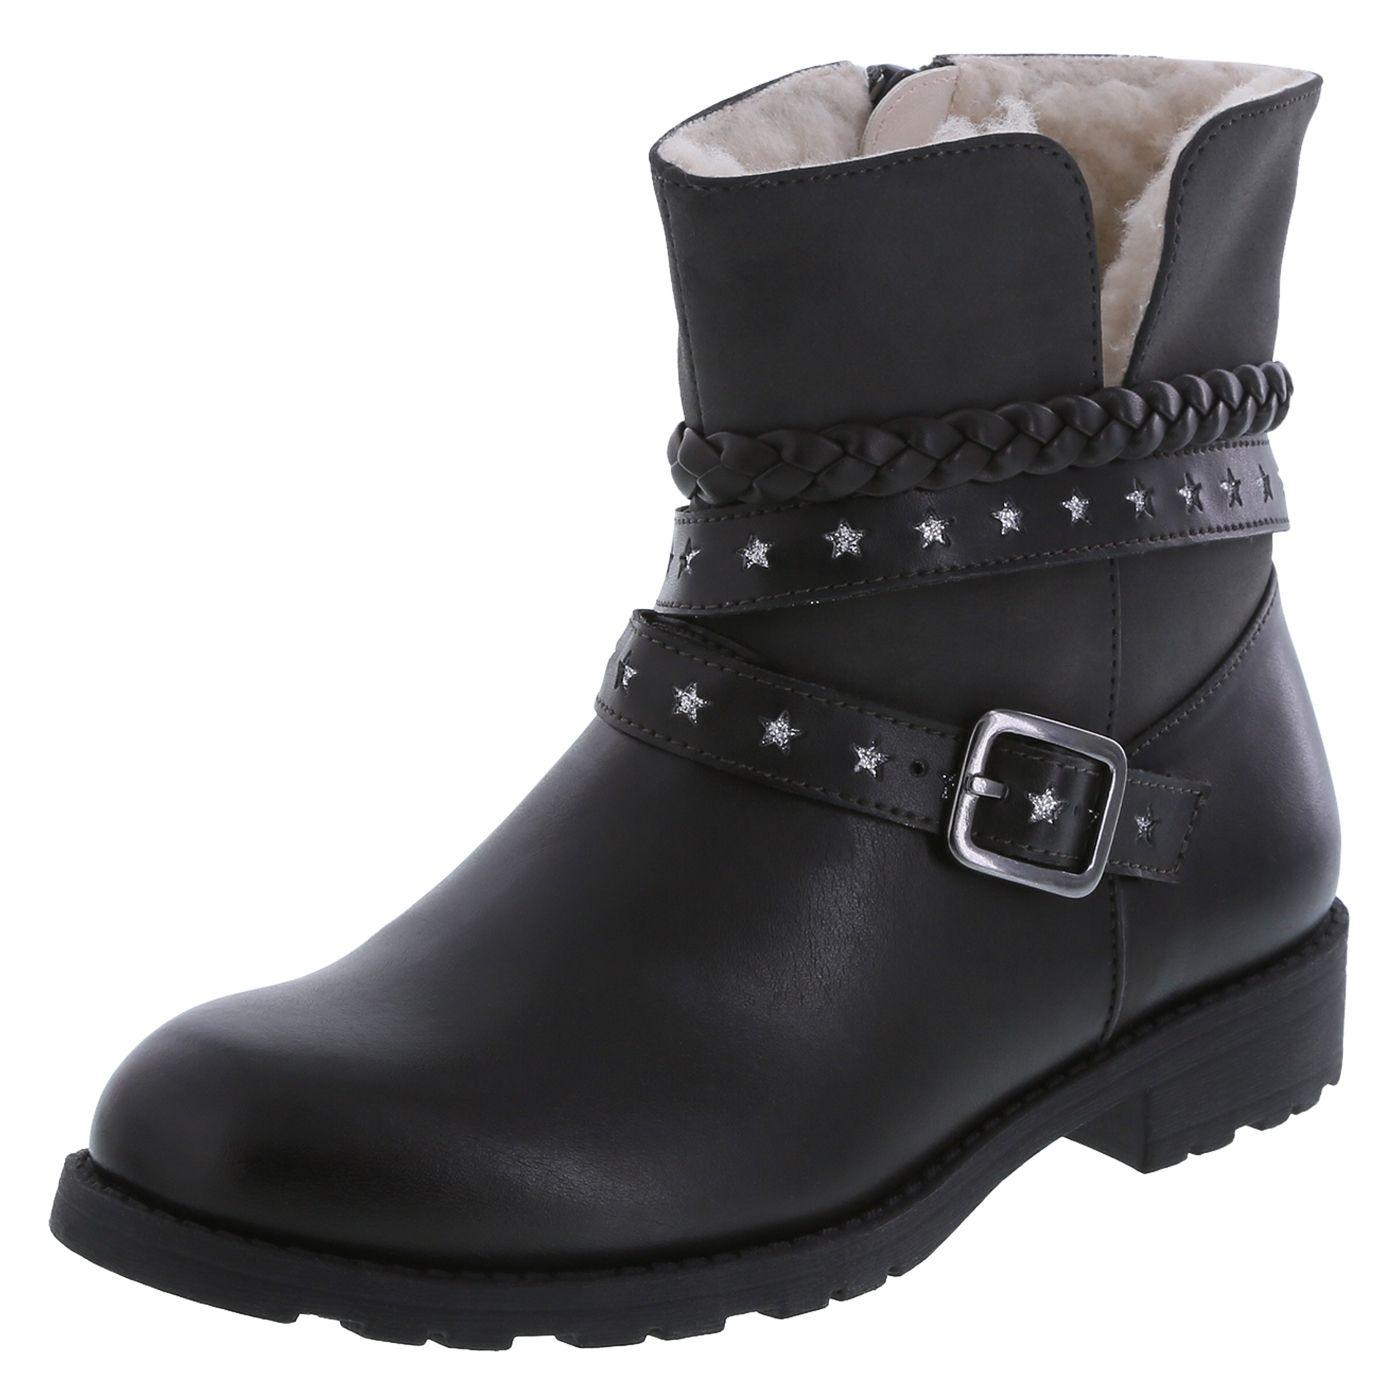 Roller shoes payless - Girls Descendants Strap Boot Descendants Payless Shoesource